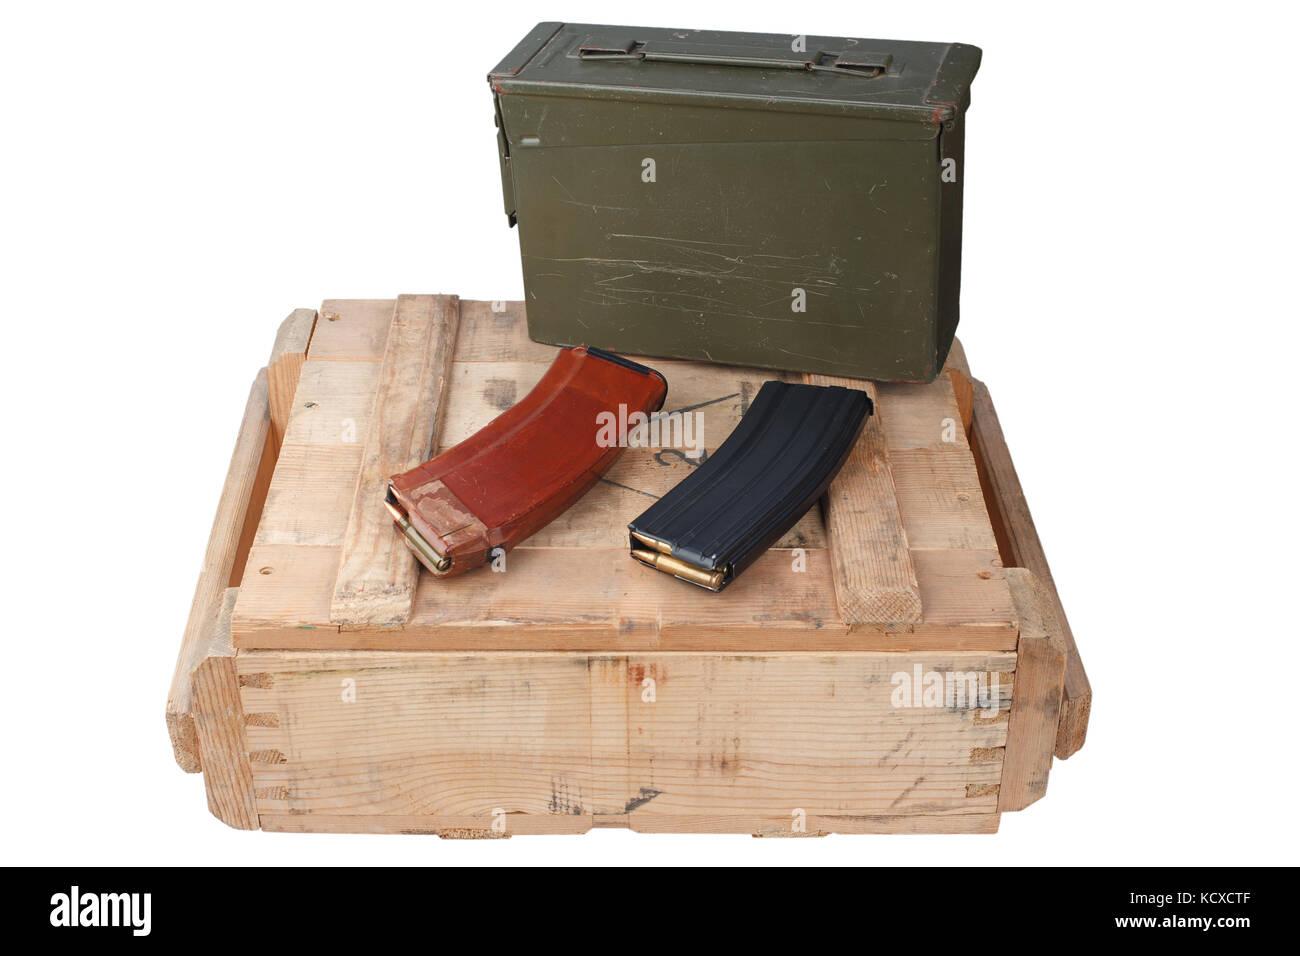 m16 and ak47 magazins on wooden box Stock Photo: 162850031